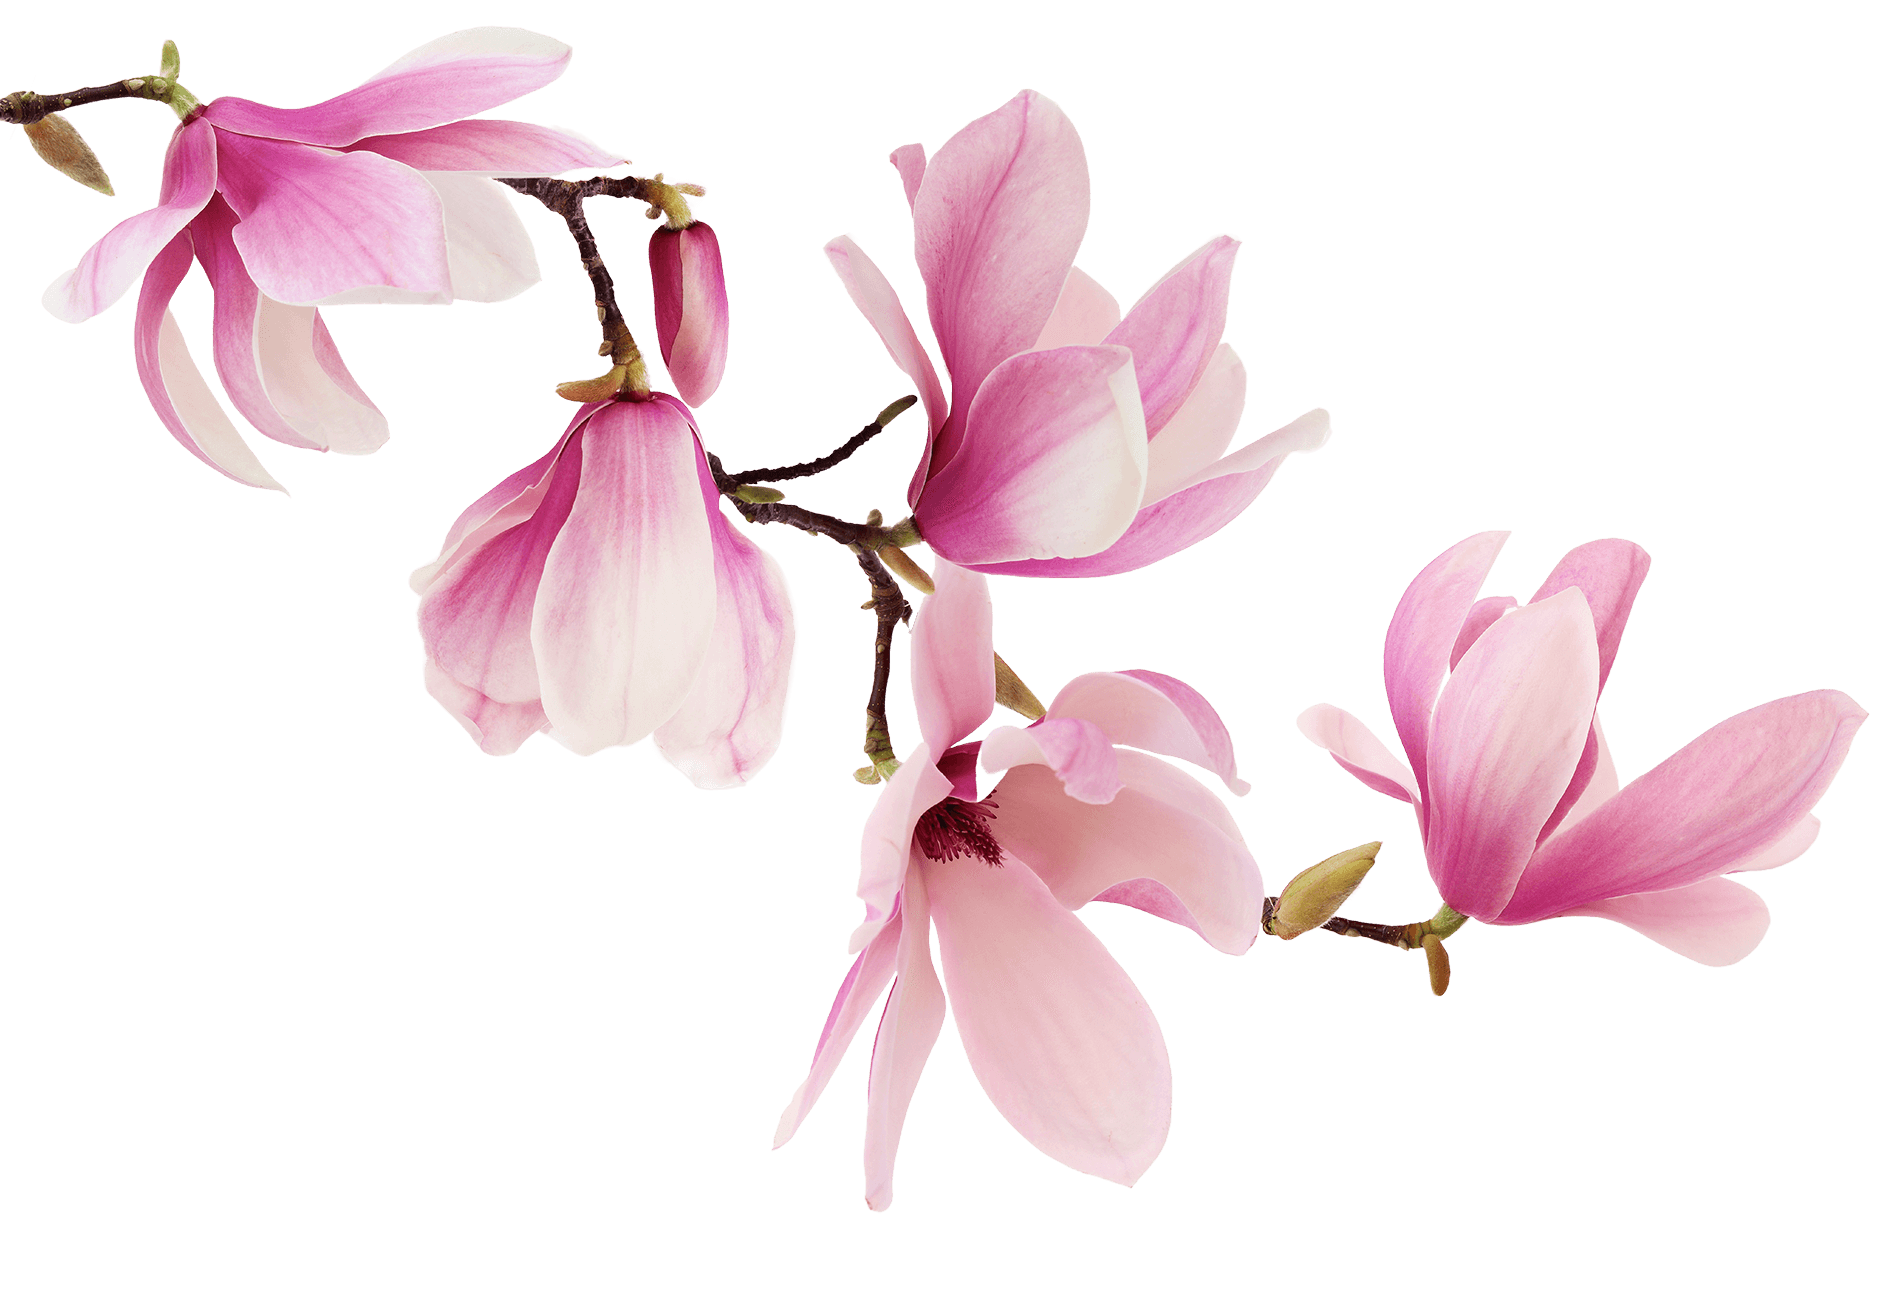 Stemningsbilde blomster